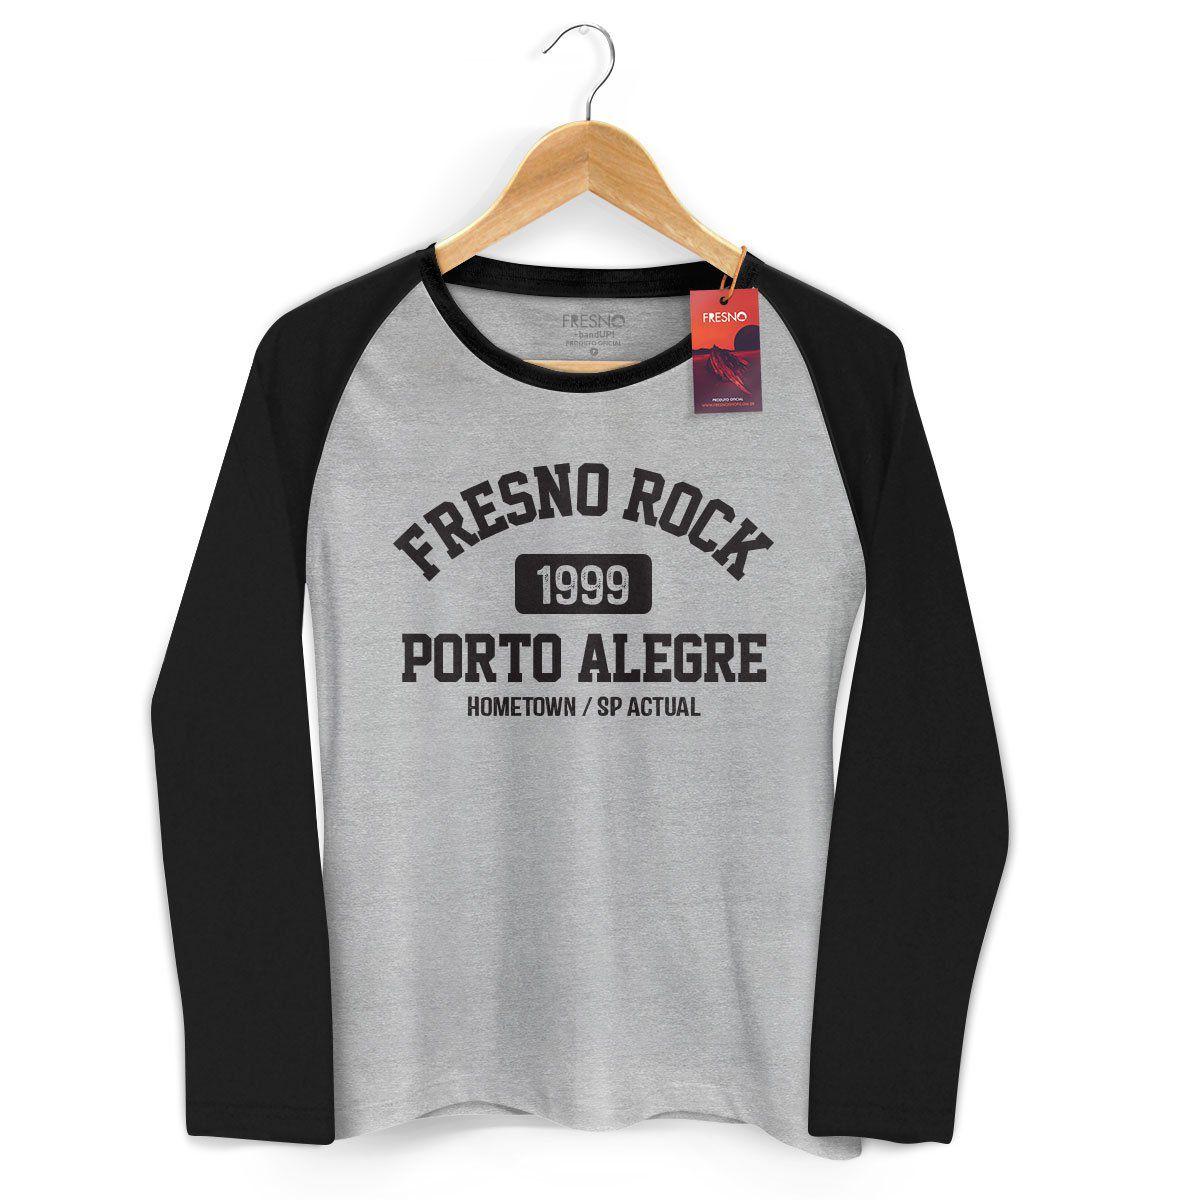 Camiseta Manga Longa Raglan Feminina Fresno Rock 4